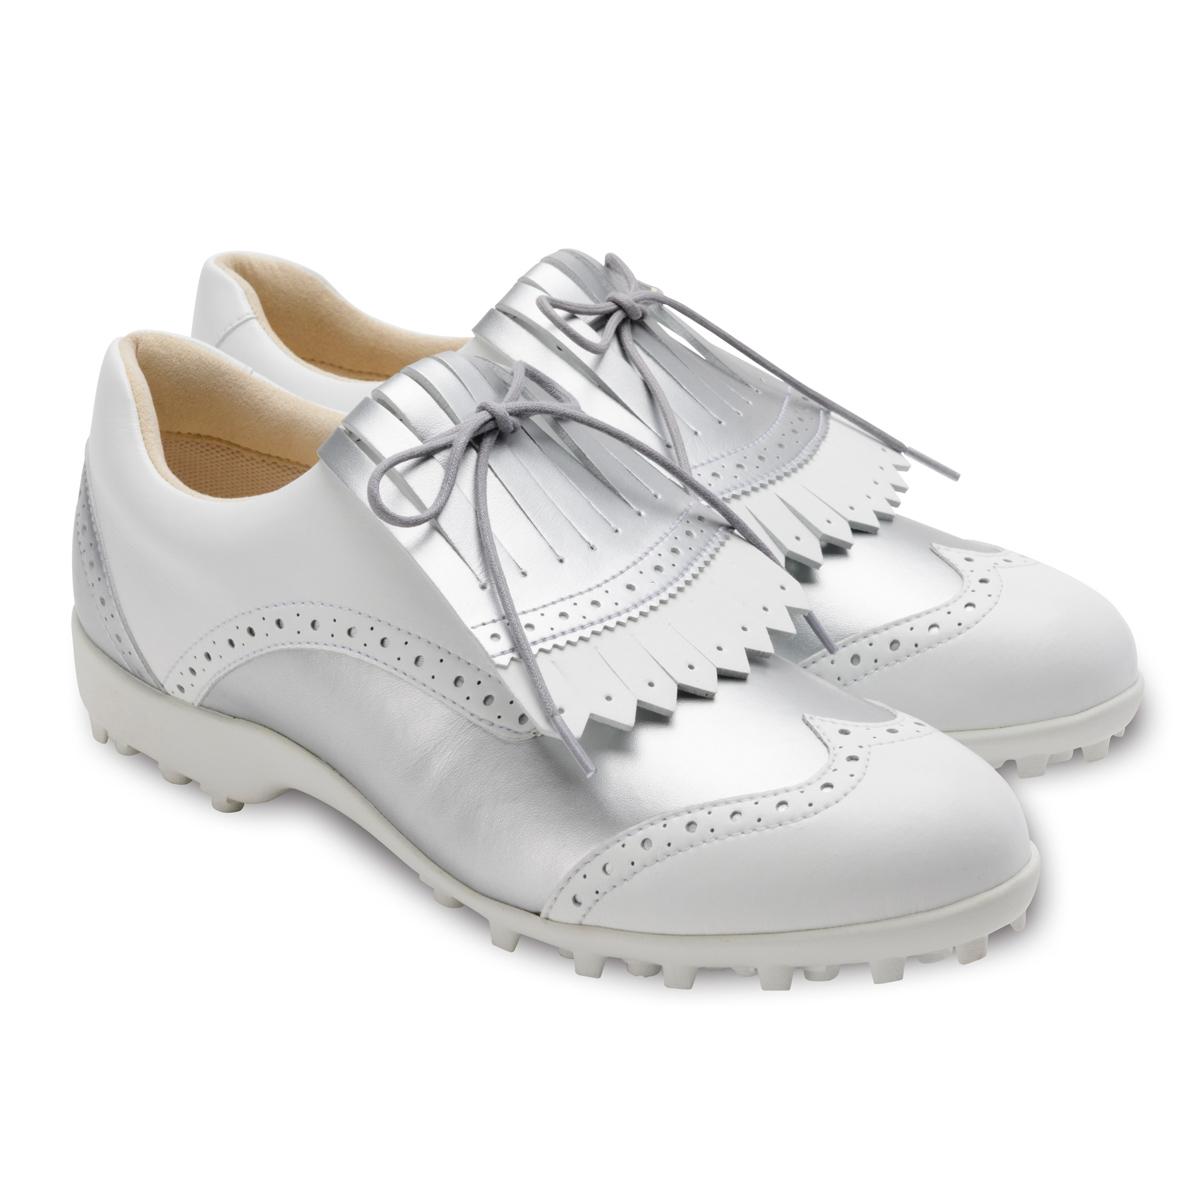 GINA ~ジーナ~ white-silver